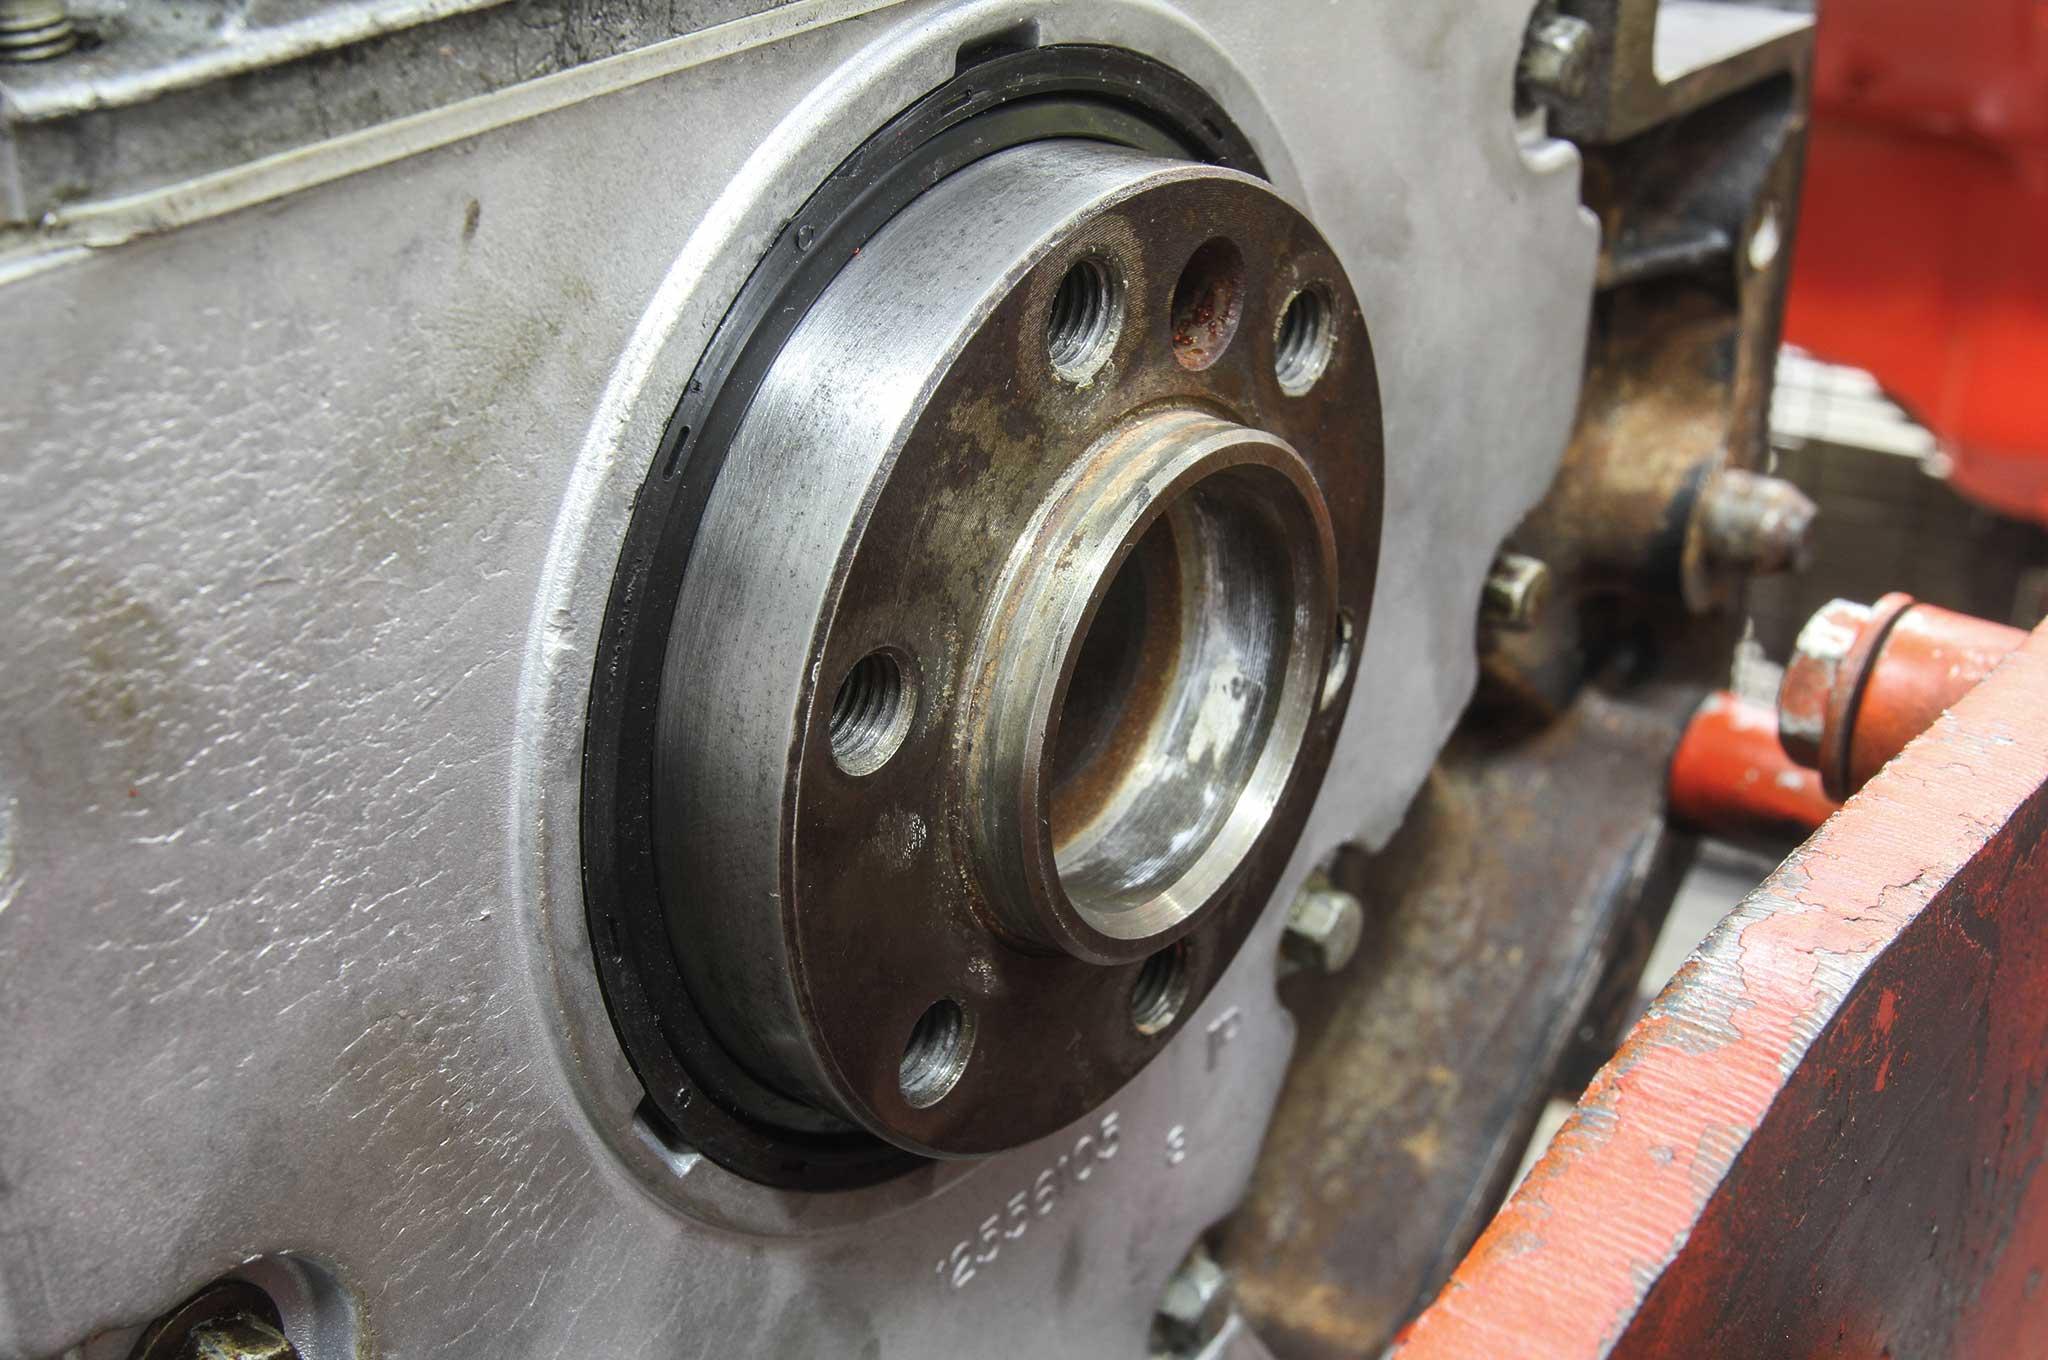 LS Swap Parts Crankshaft Flange - Lowrider